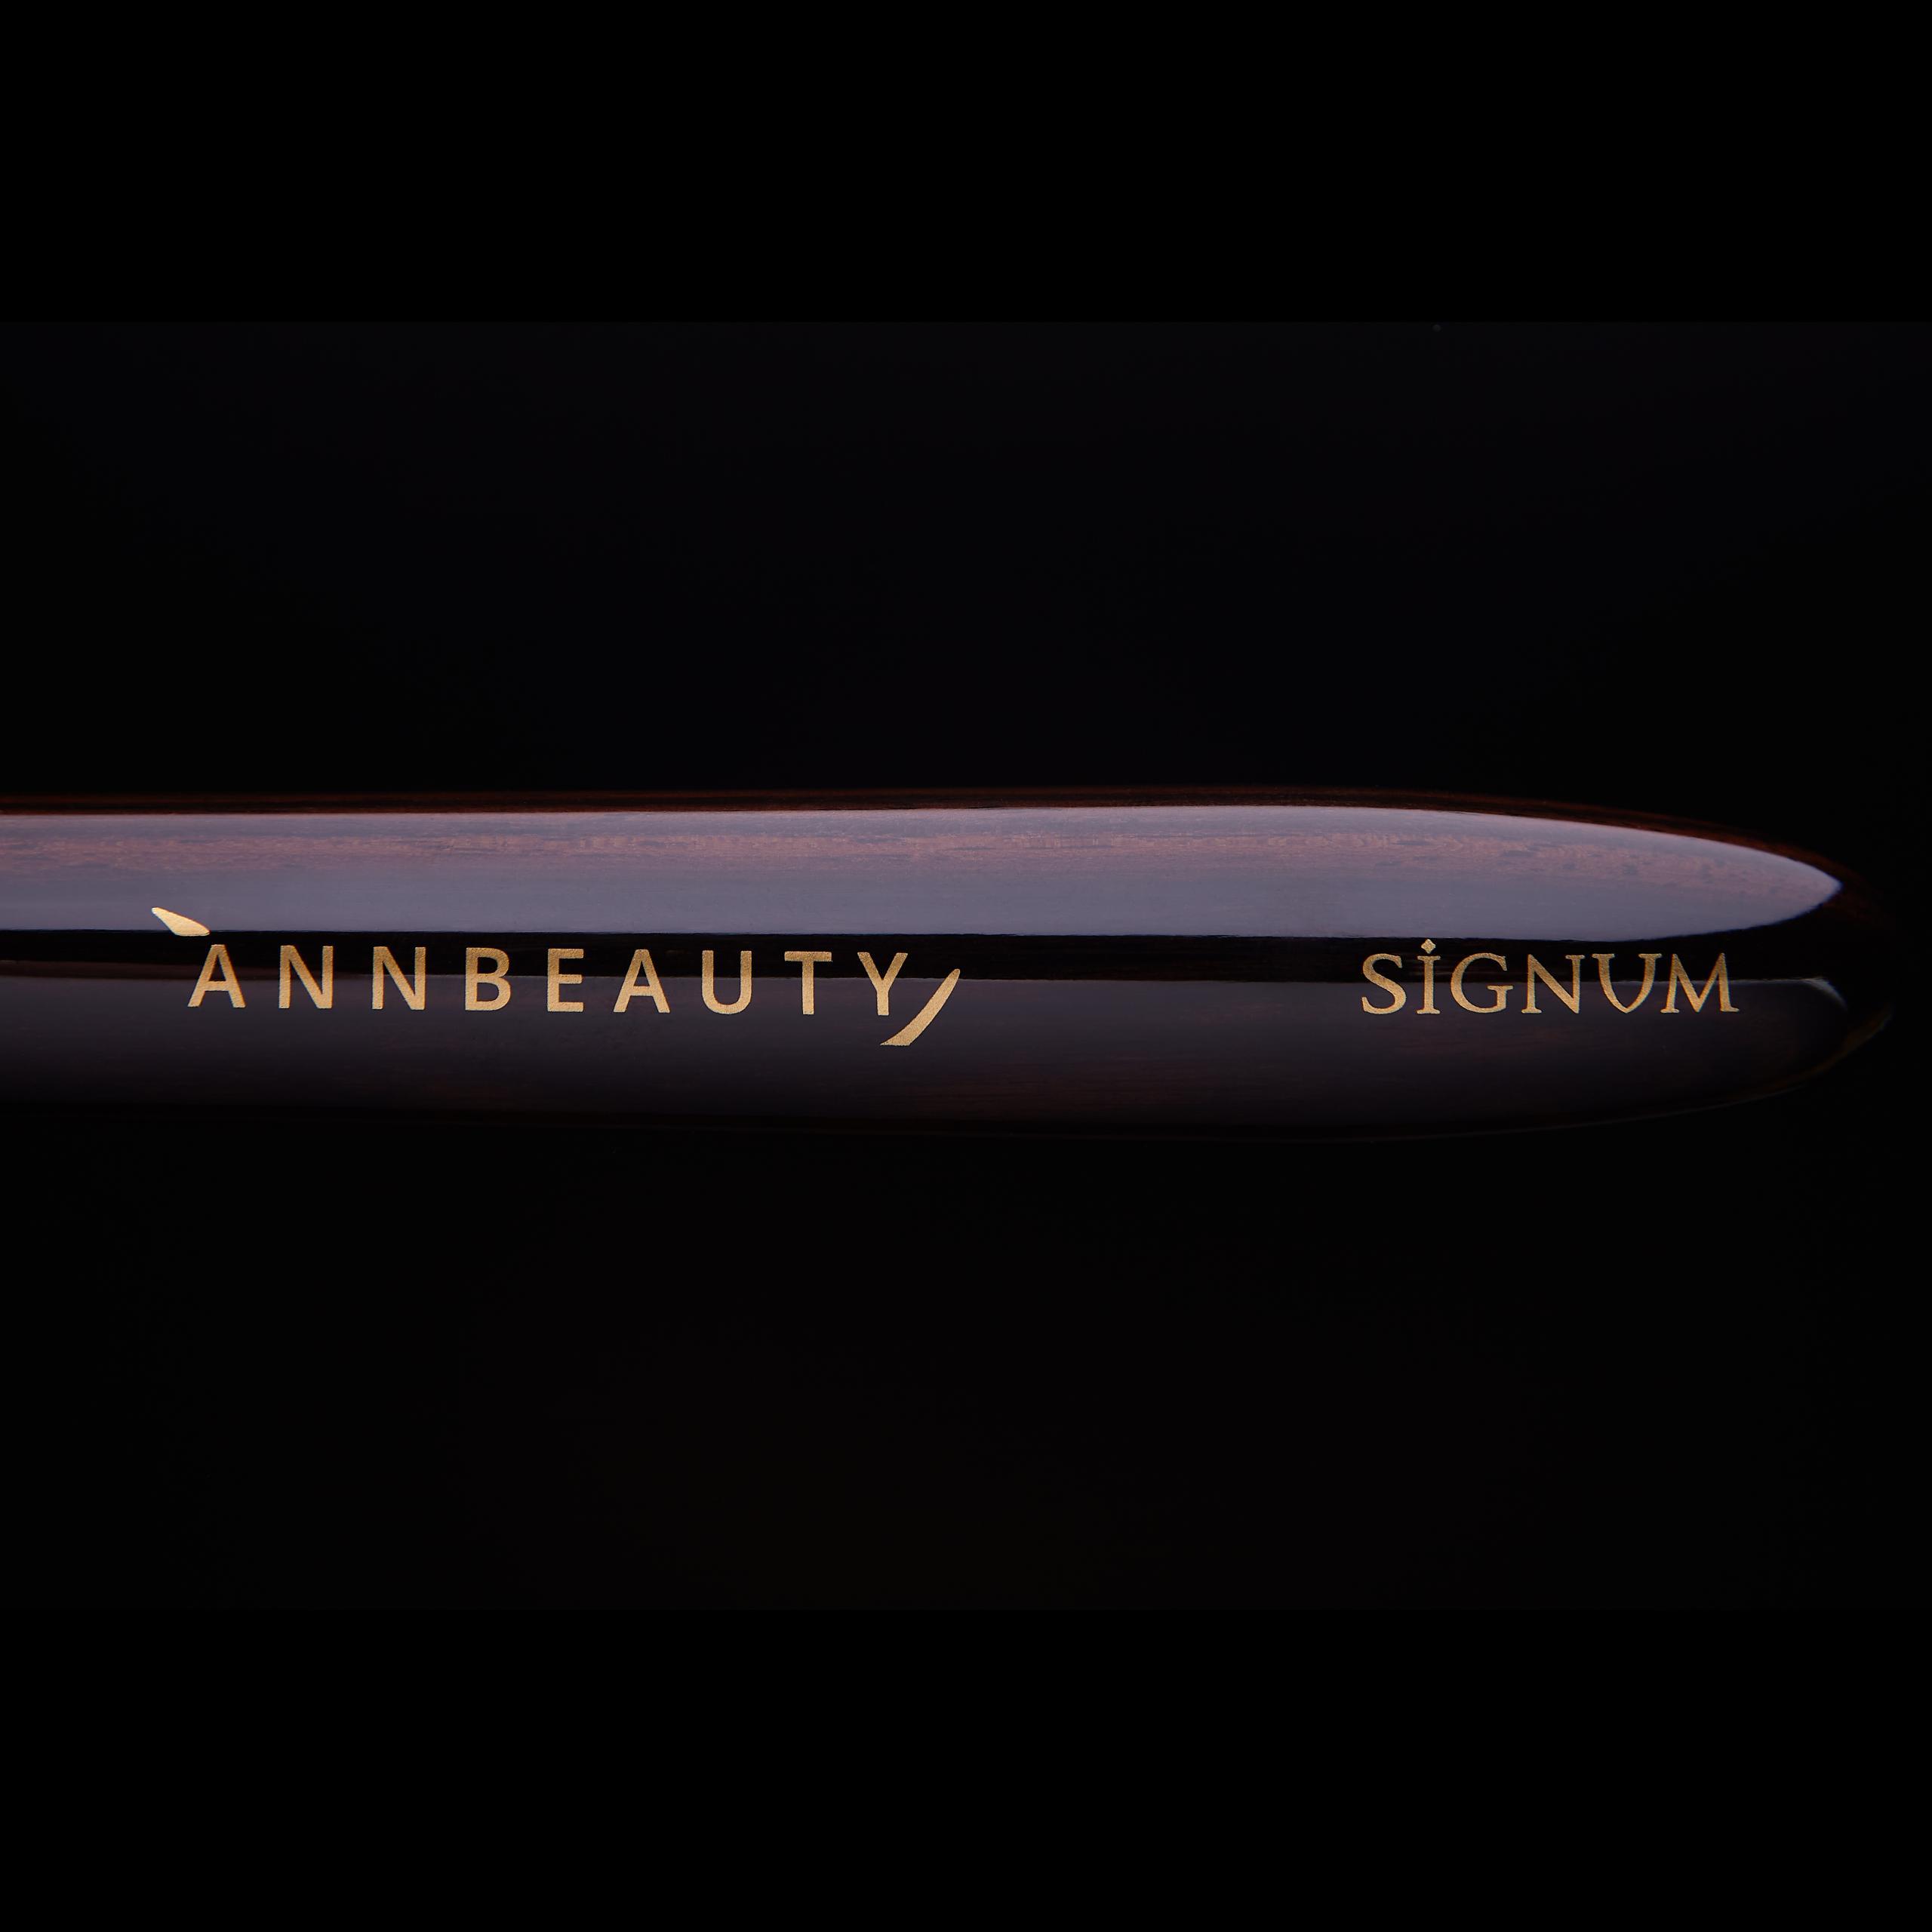 Annbeuty SIGNUM баннер для мобильного